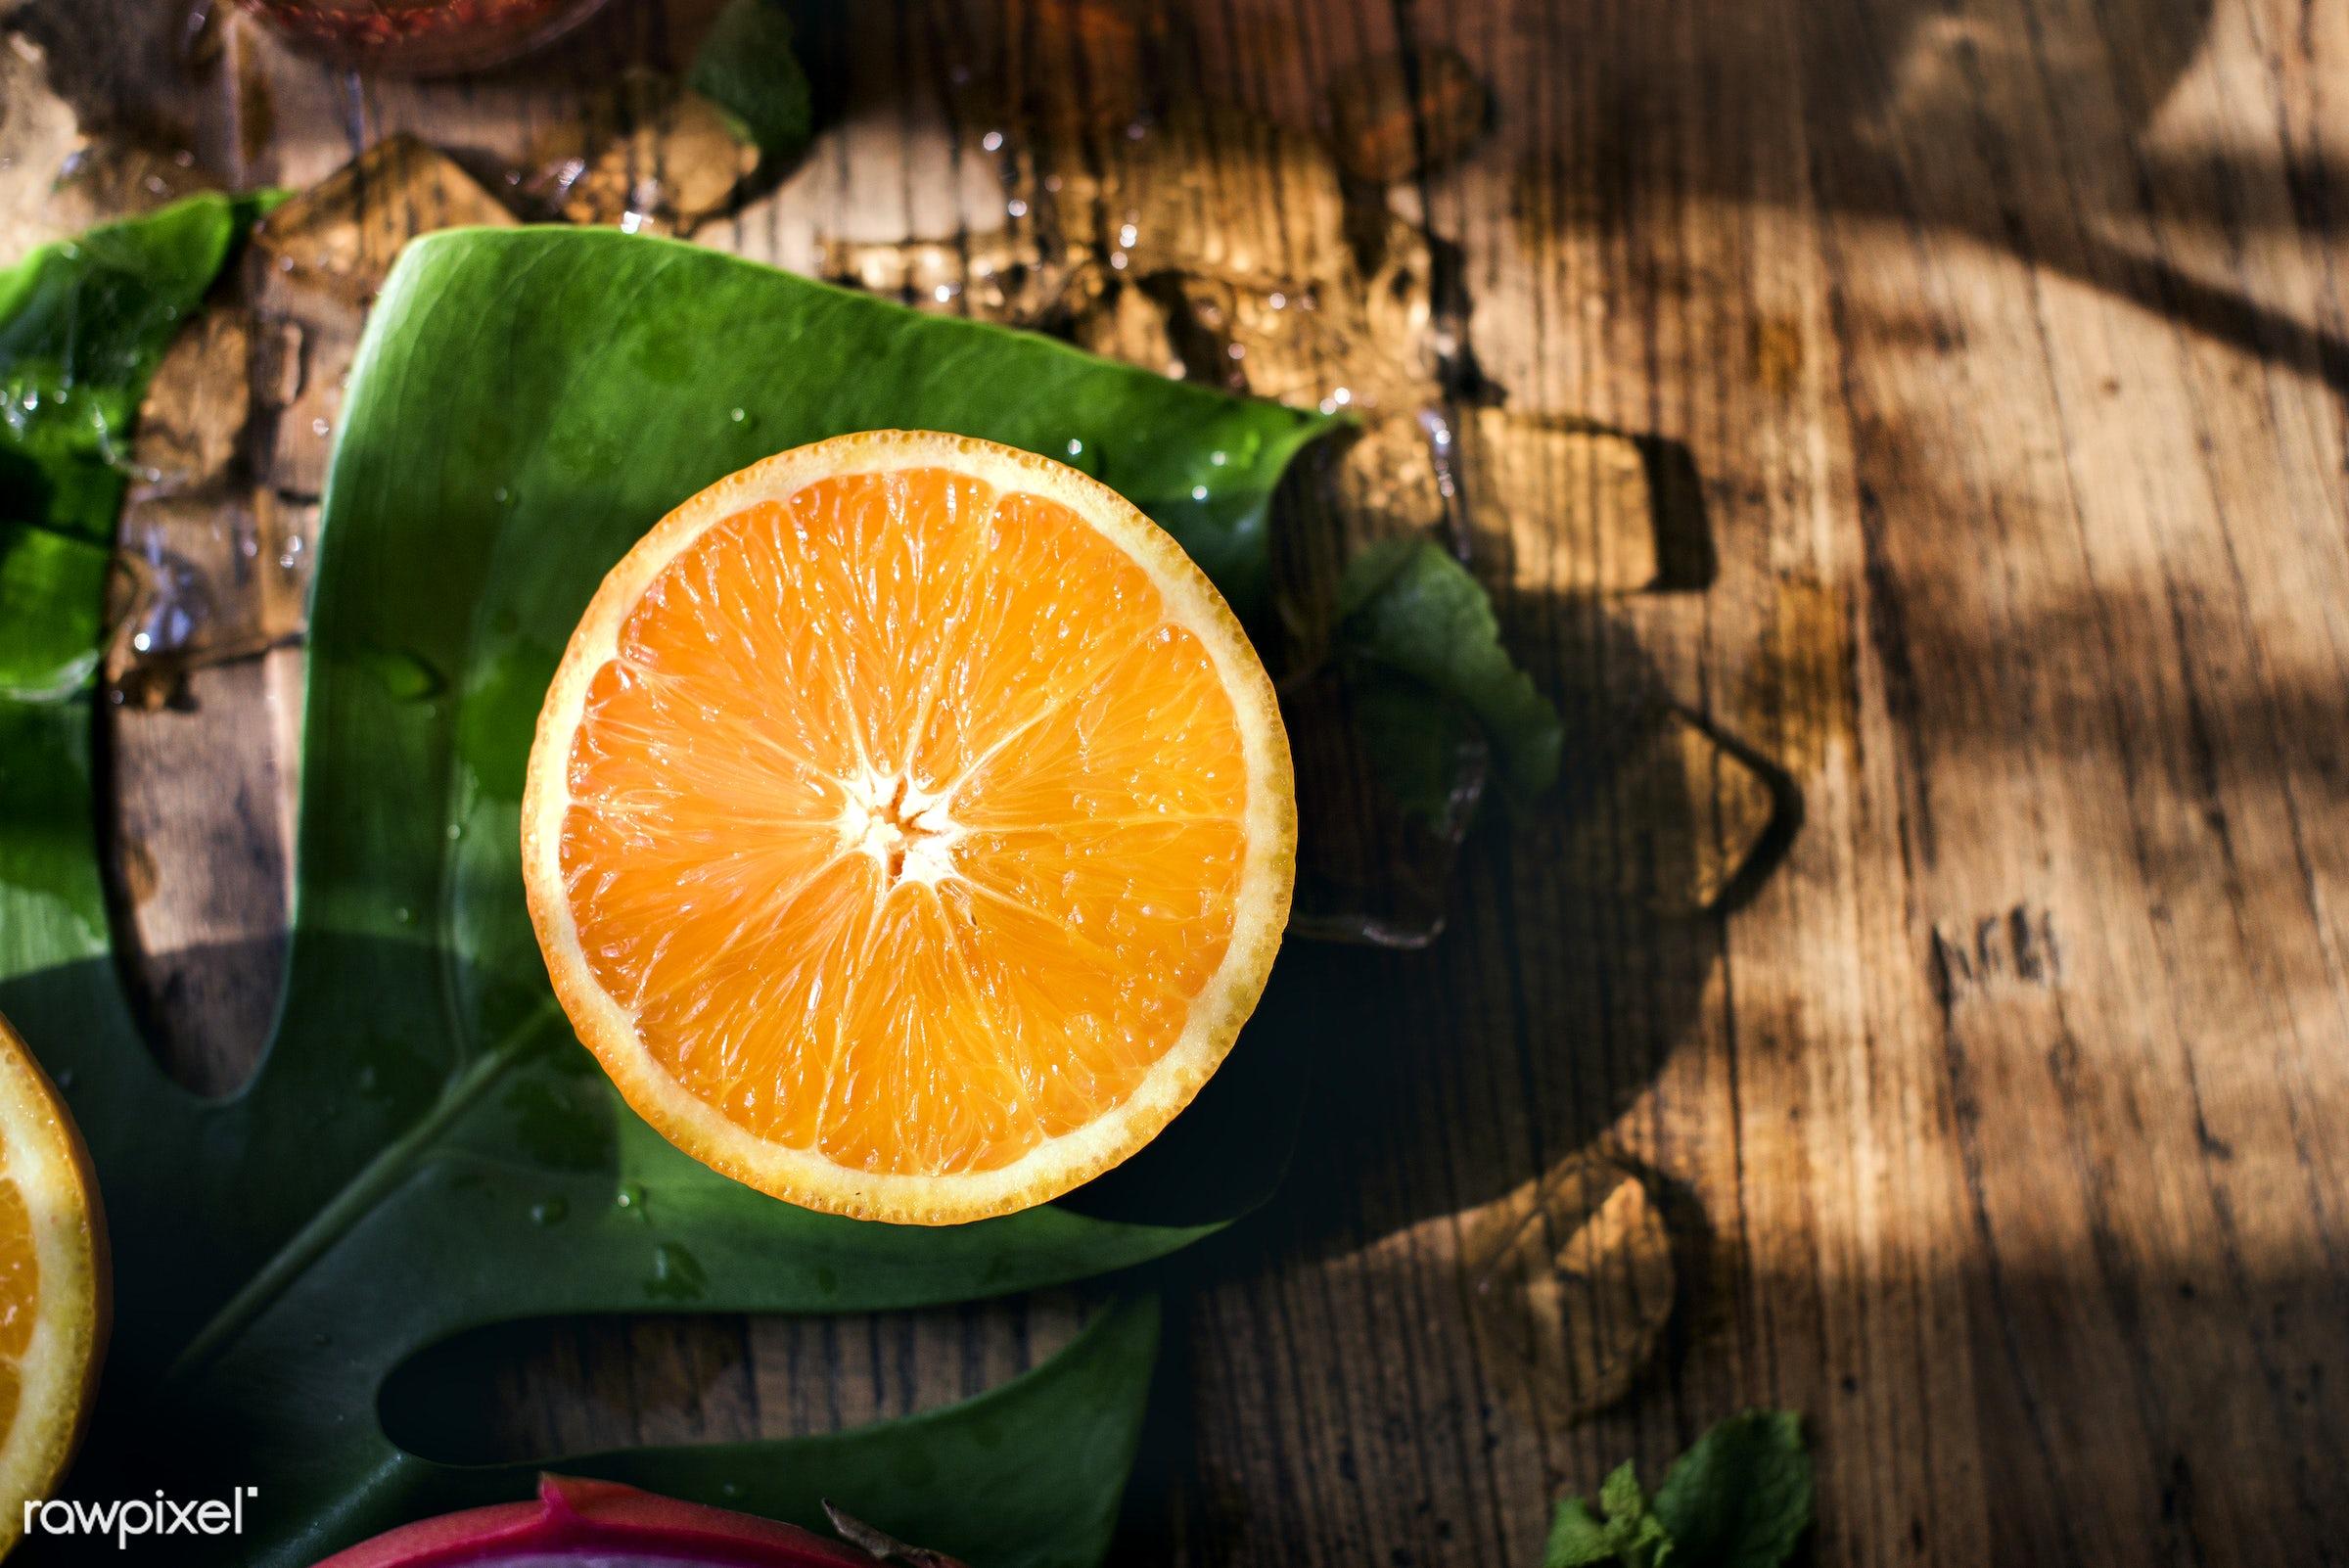 nutritious, tropical, round, refreshing, fresh, juice, antioxidant, piece, orange, fruit, refreshment, fruits, edible, tasty...